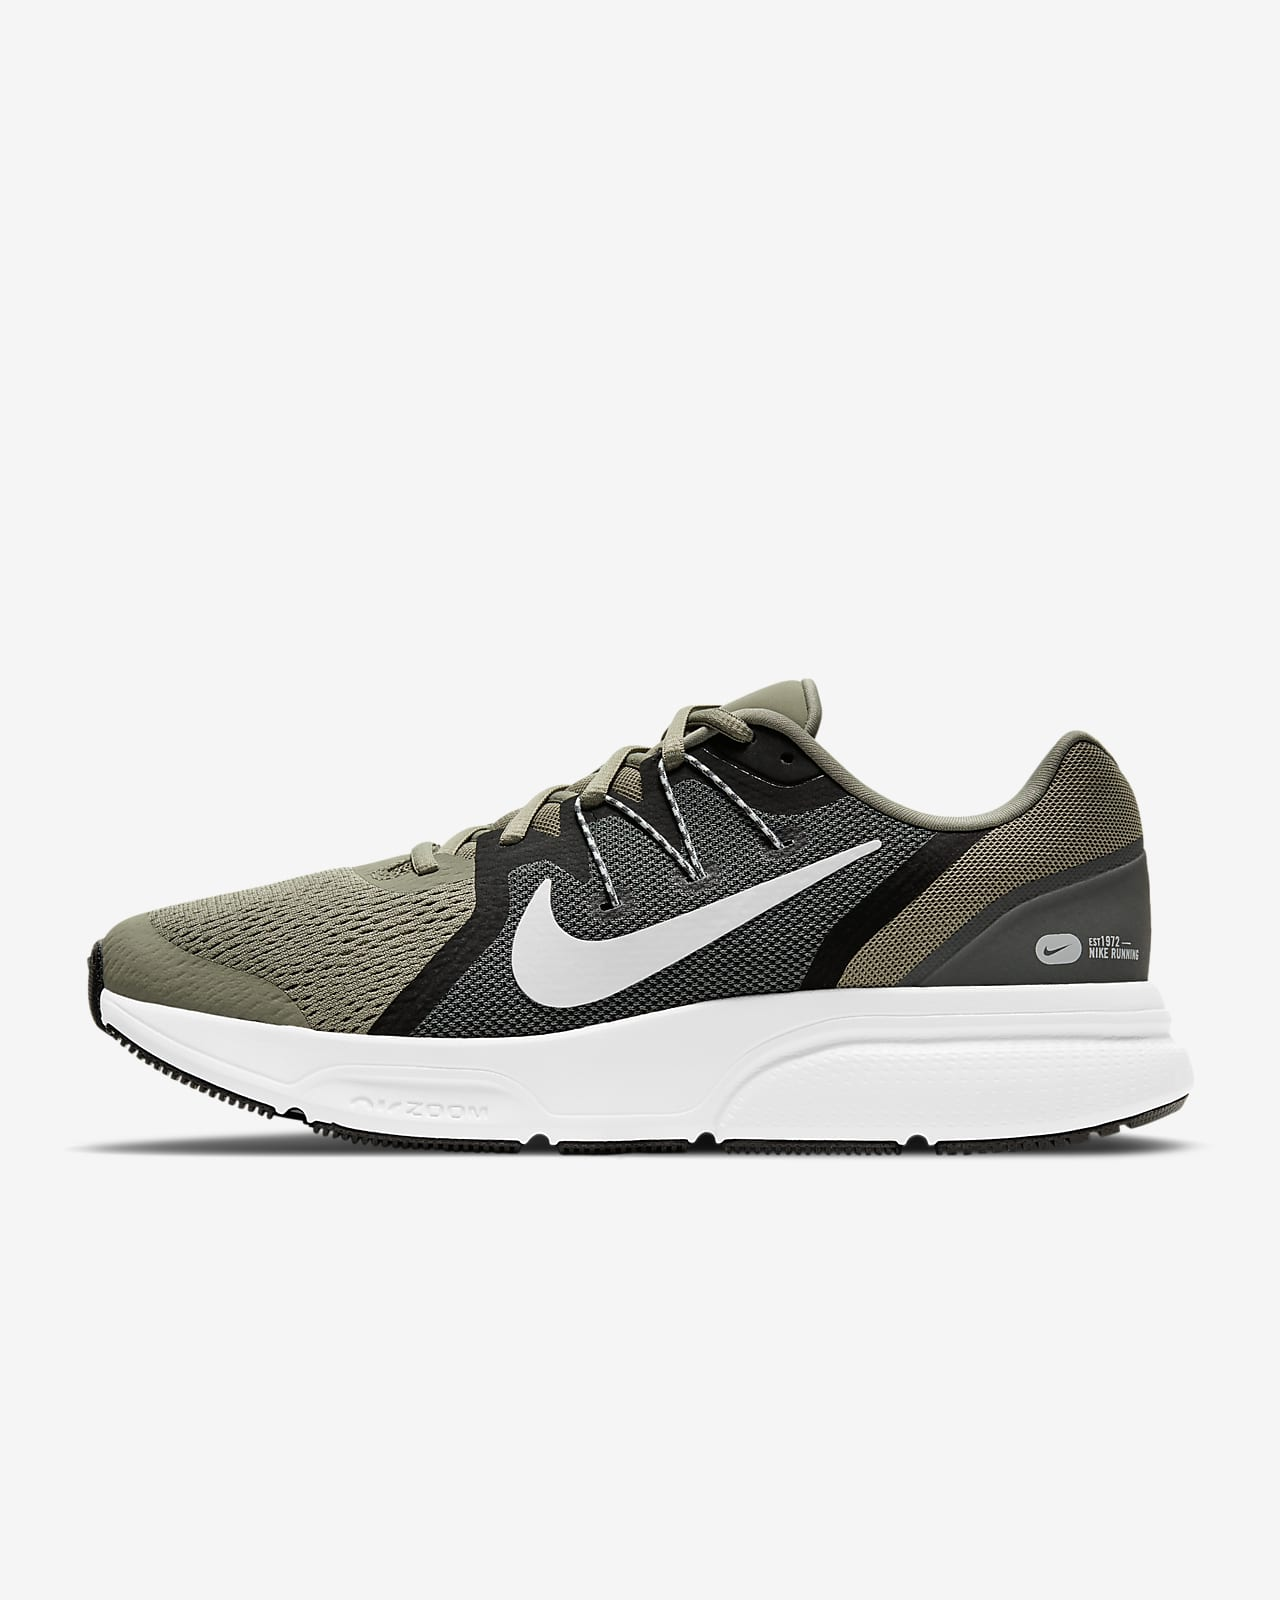 Nike Zoom Span 3 Men's Road Running Shoes